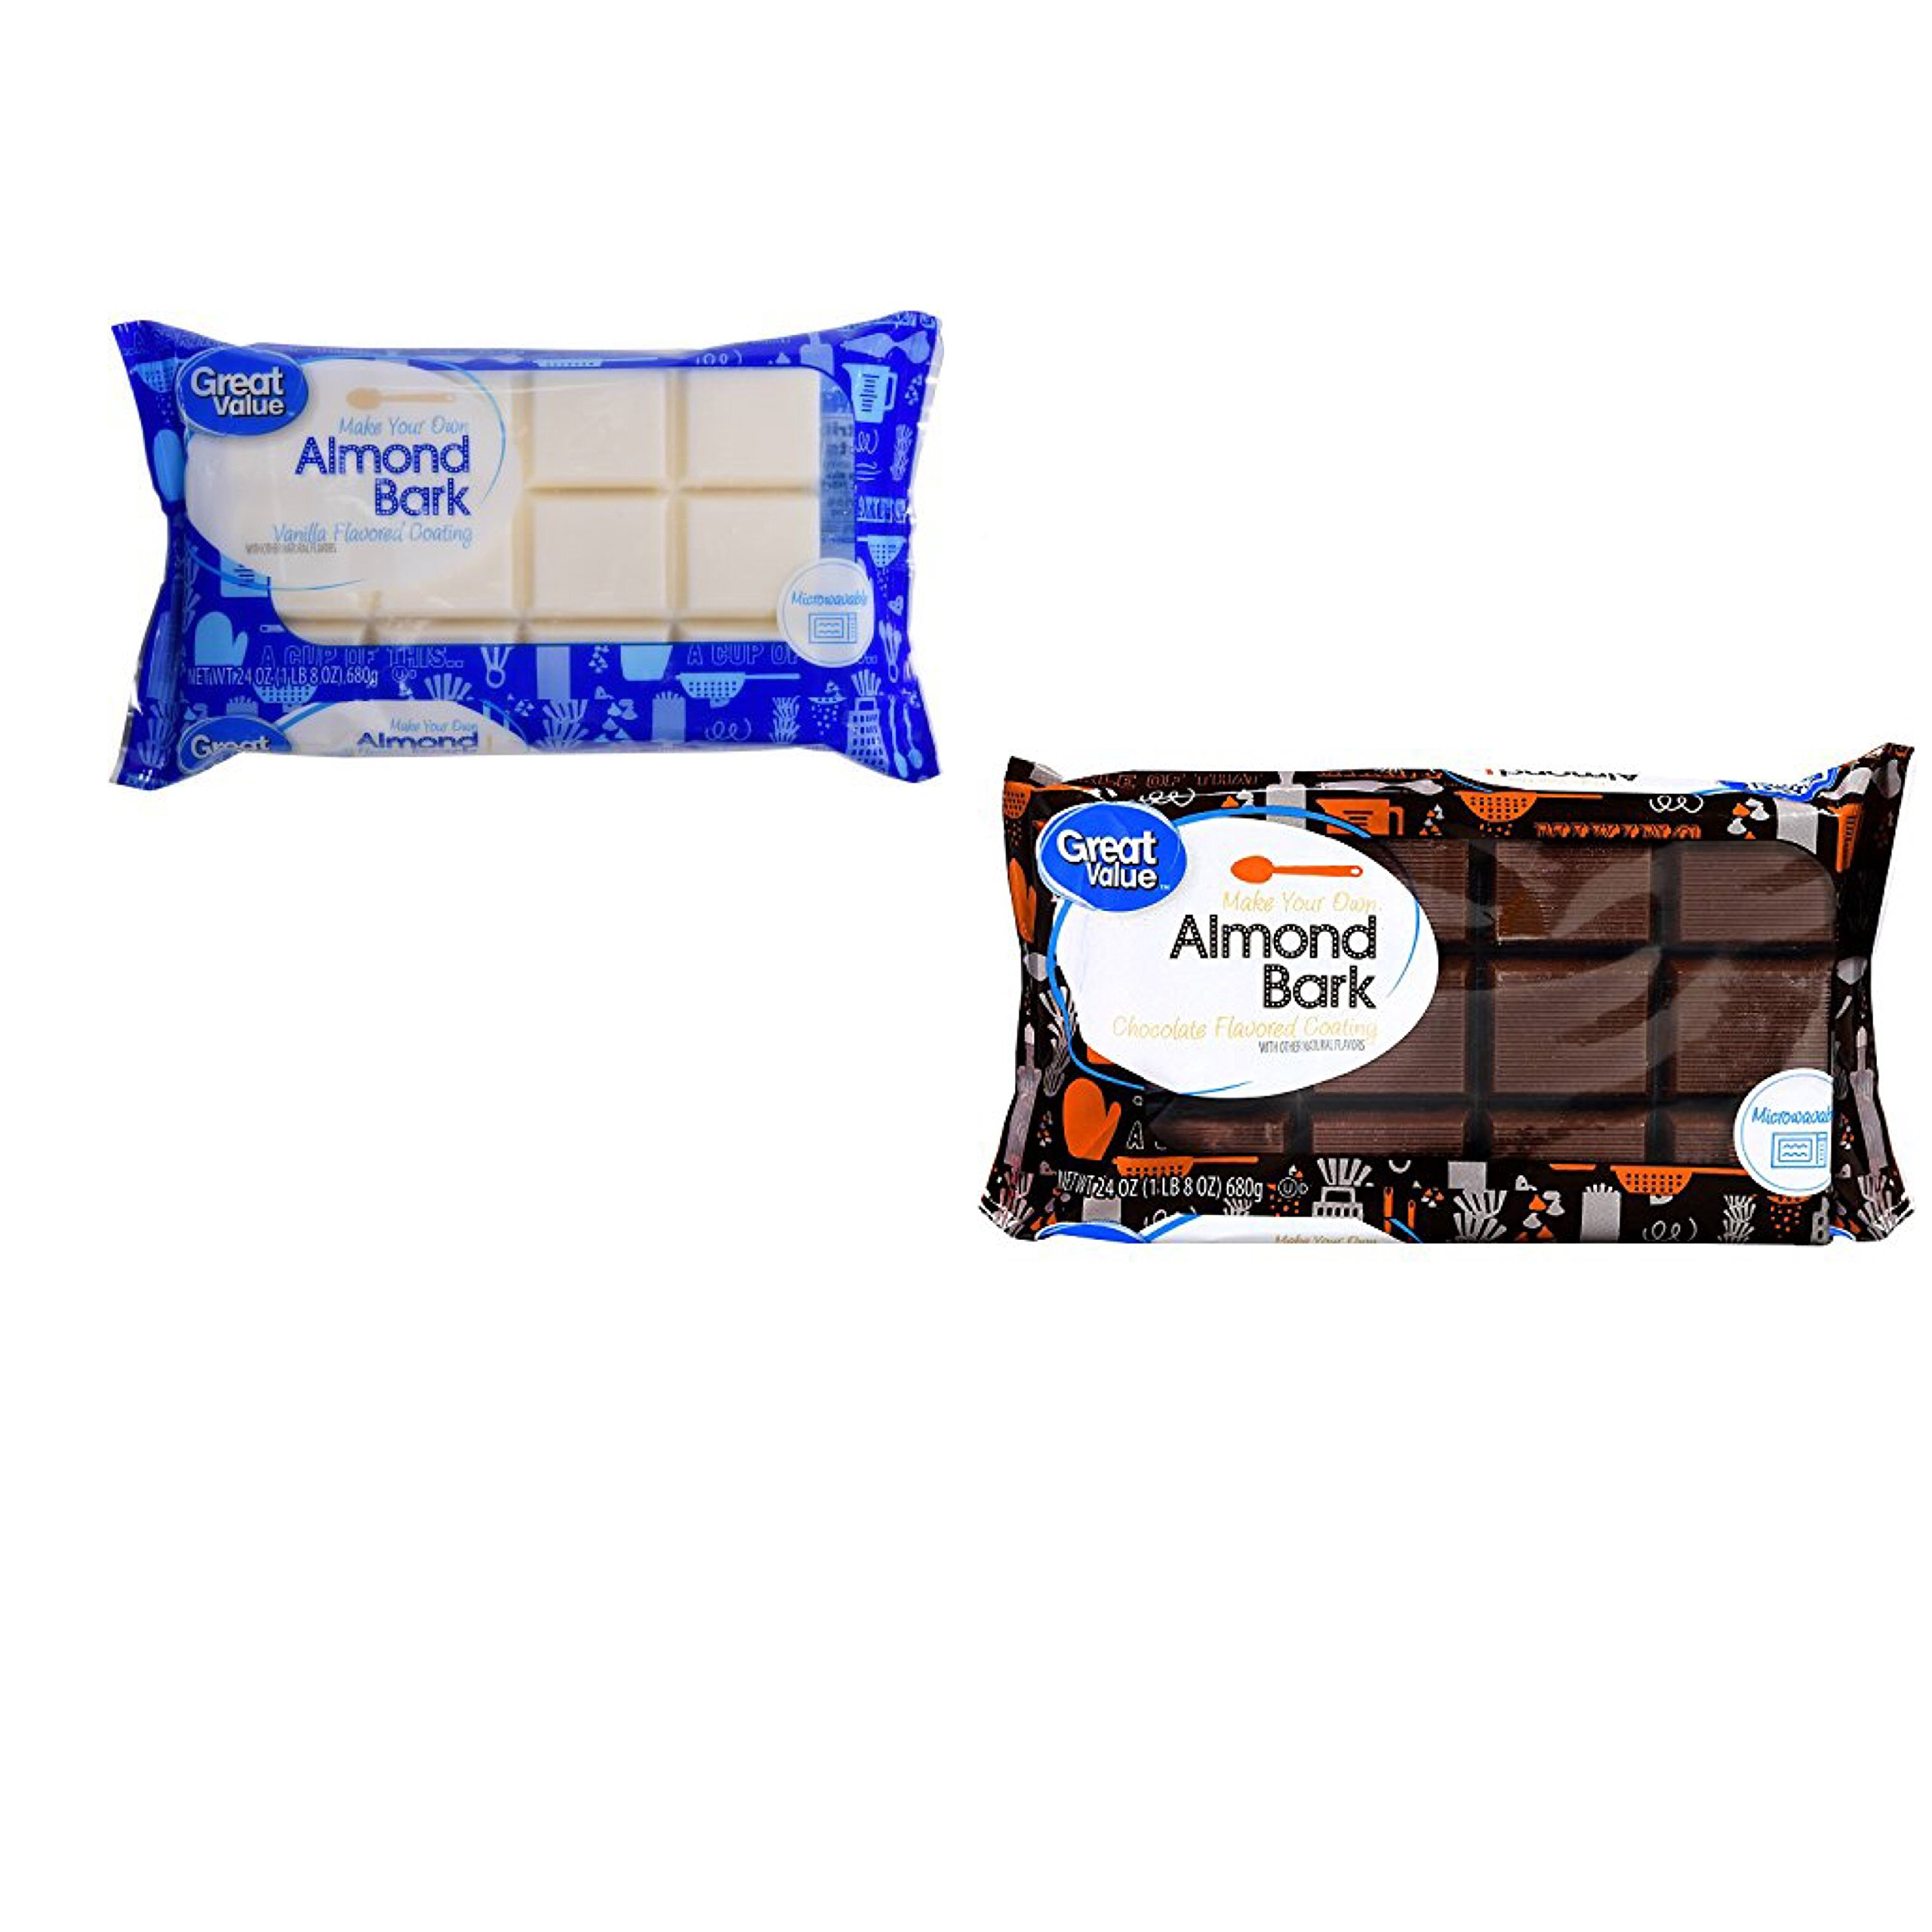 Great Value Chocolate Almond Bark AND Vanilla Almond Bark, 24 oz , 1 of each